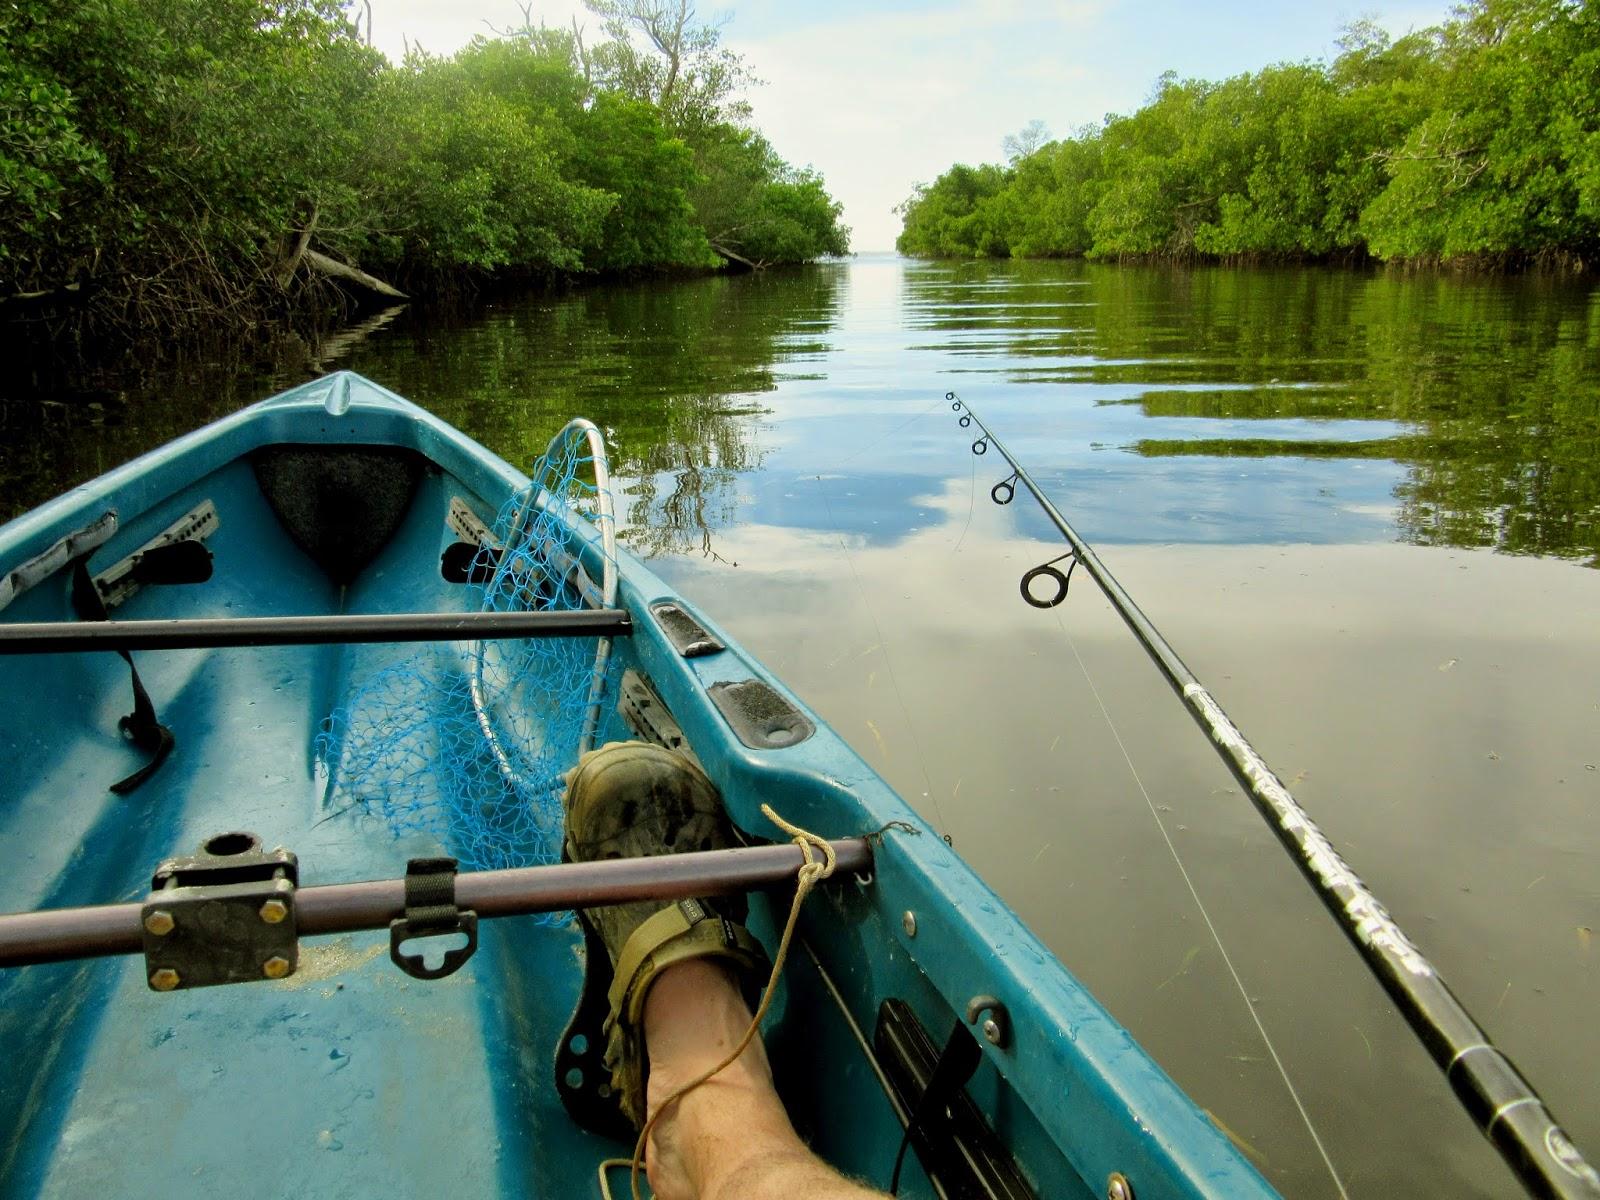 River mud kayak fishing the peace river for River fishing kayak